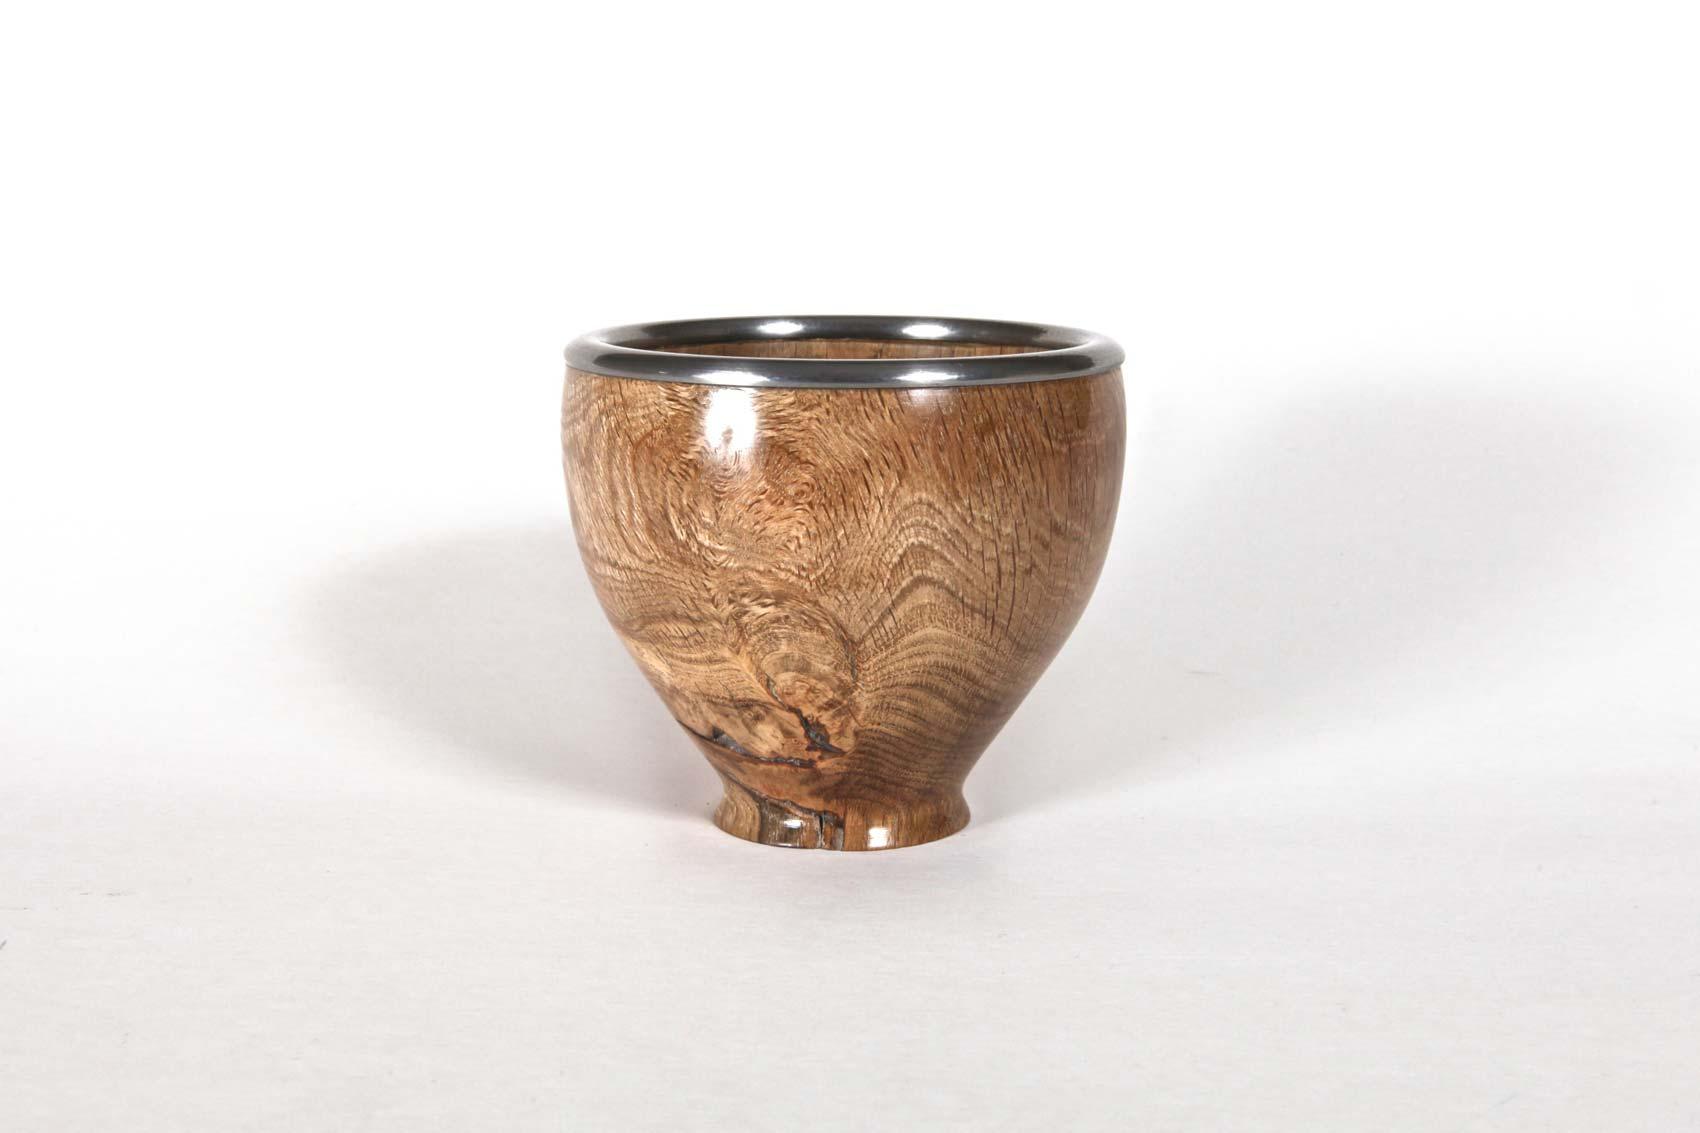 oak-crucible-pot-with-pewter-rim